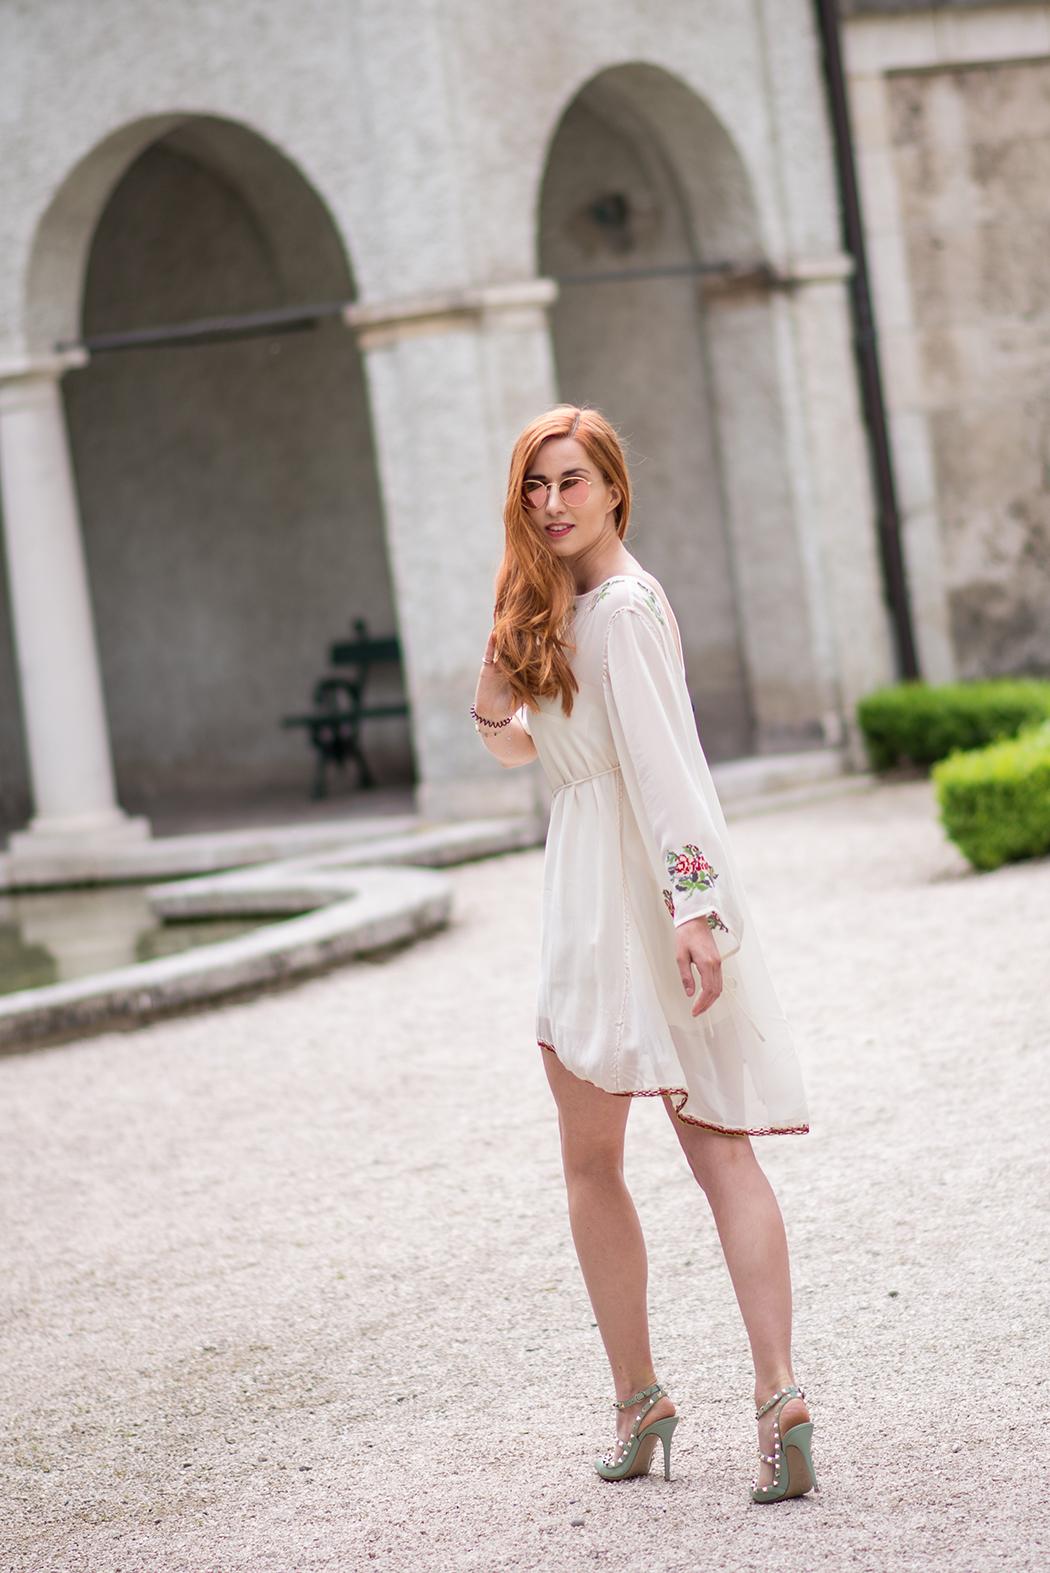 Twin-Set-Hippie-Kleid-Valentino-Rockstuds-Heels-Rote-Haare-Blogger-Linda-Rella-Fashionblog-Fashionblogger-Blog-Lifestyle-Linda-Fashion-5